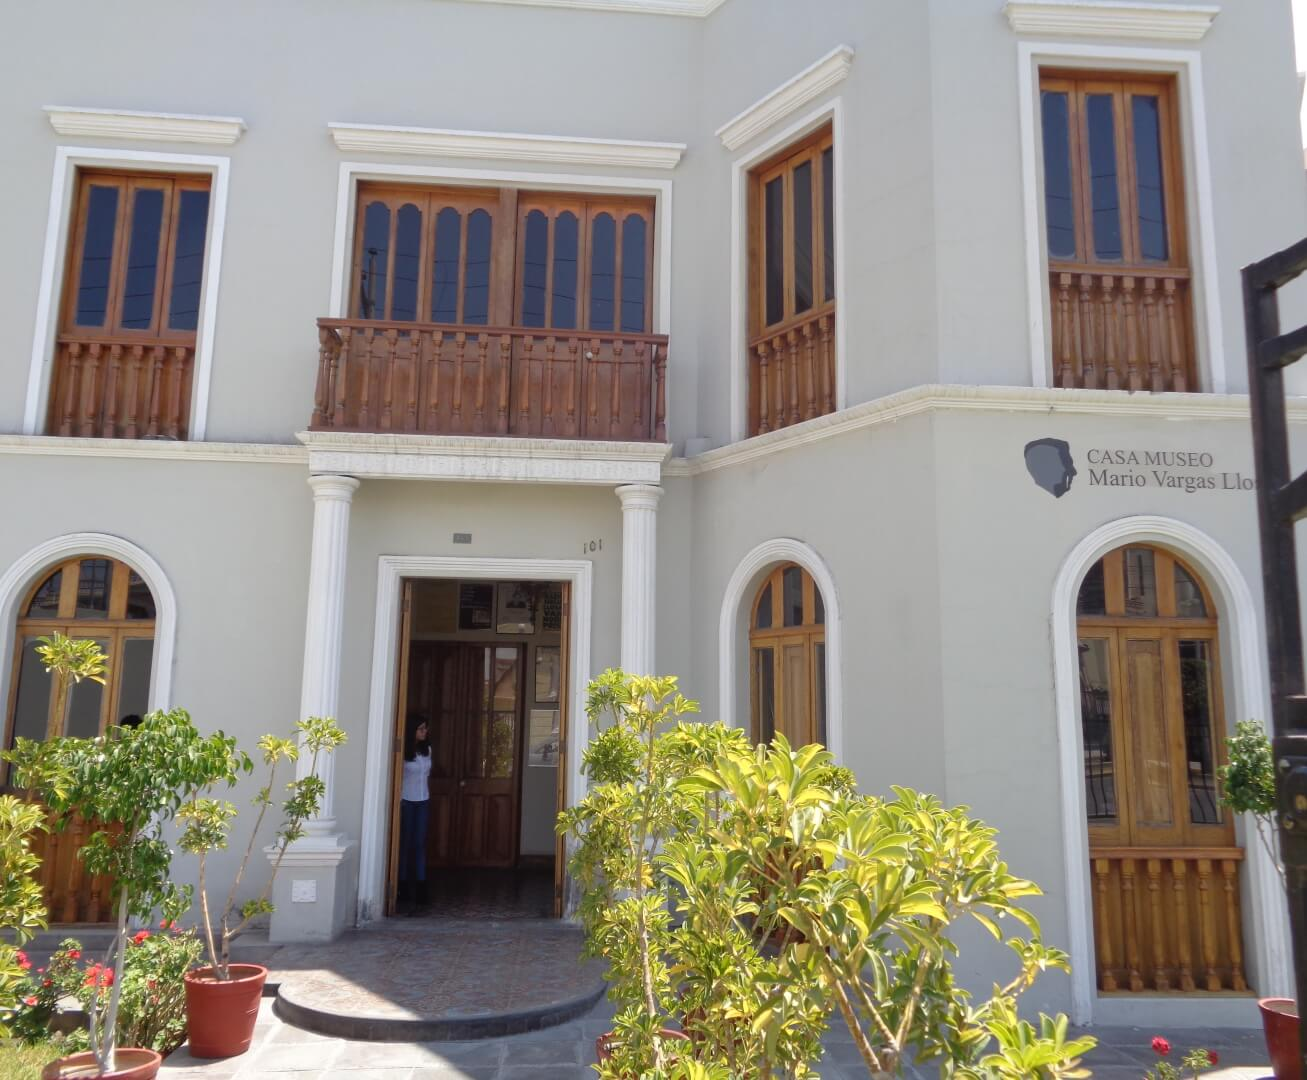 Casa Museo Maria Vargos Llosa